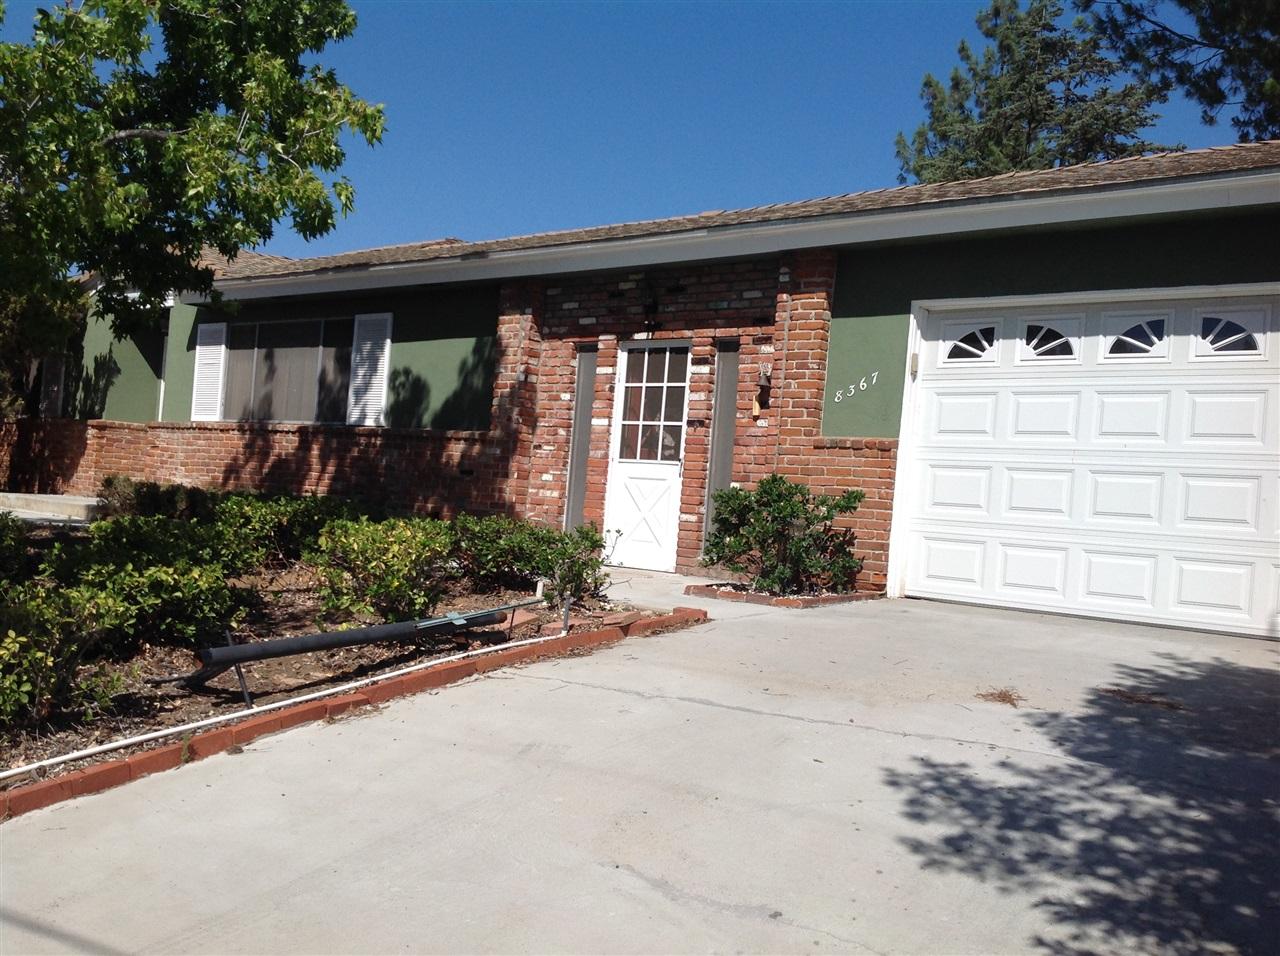 8367 Merrill Dr, Lakeside, CA